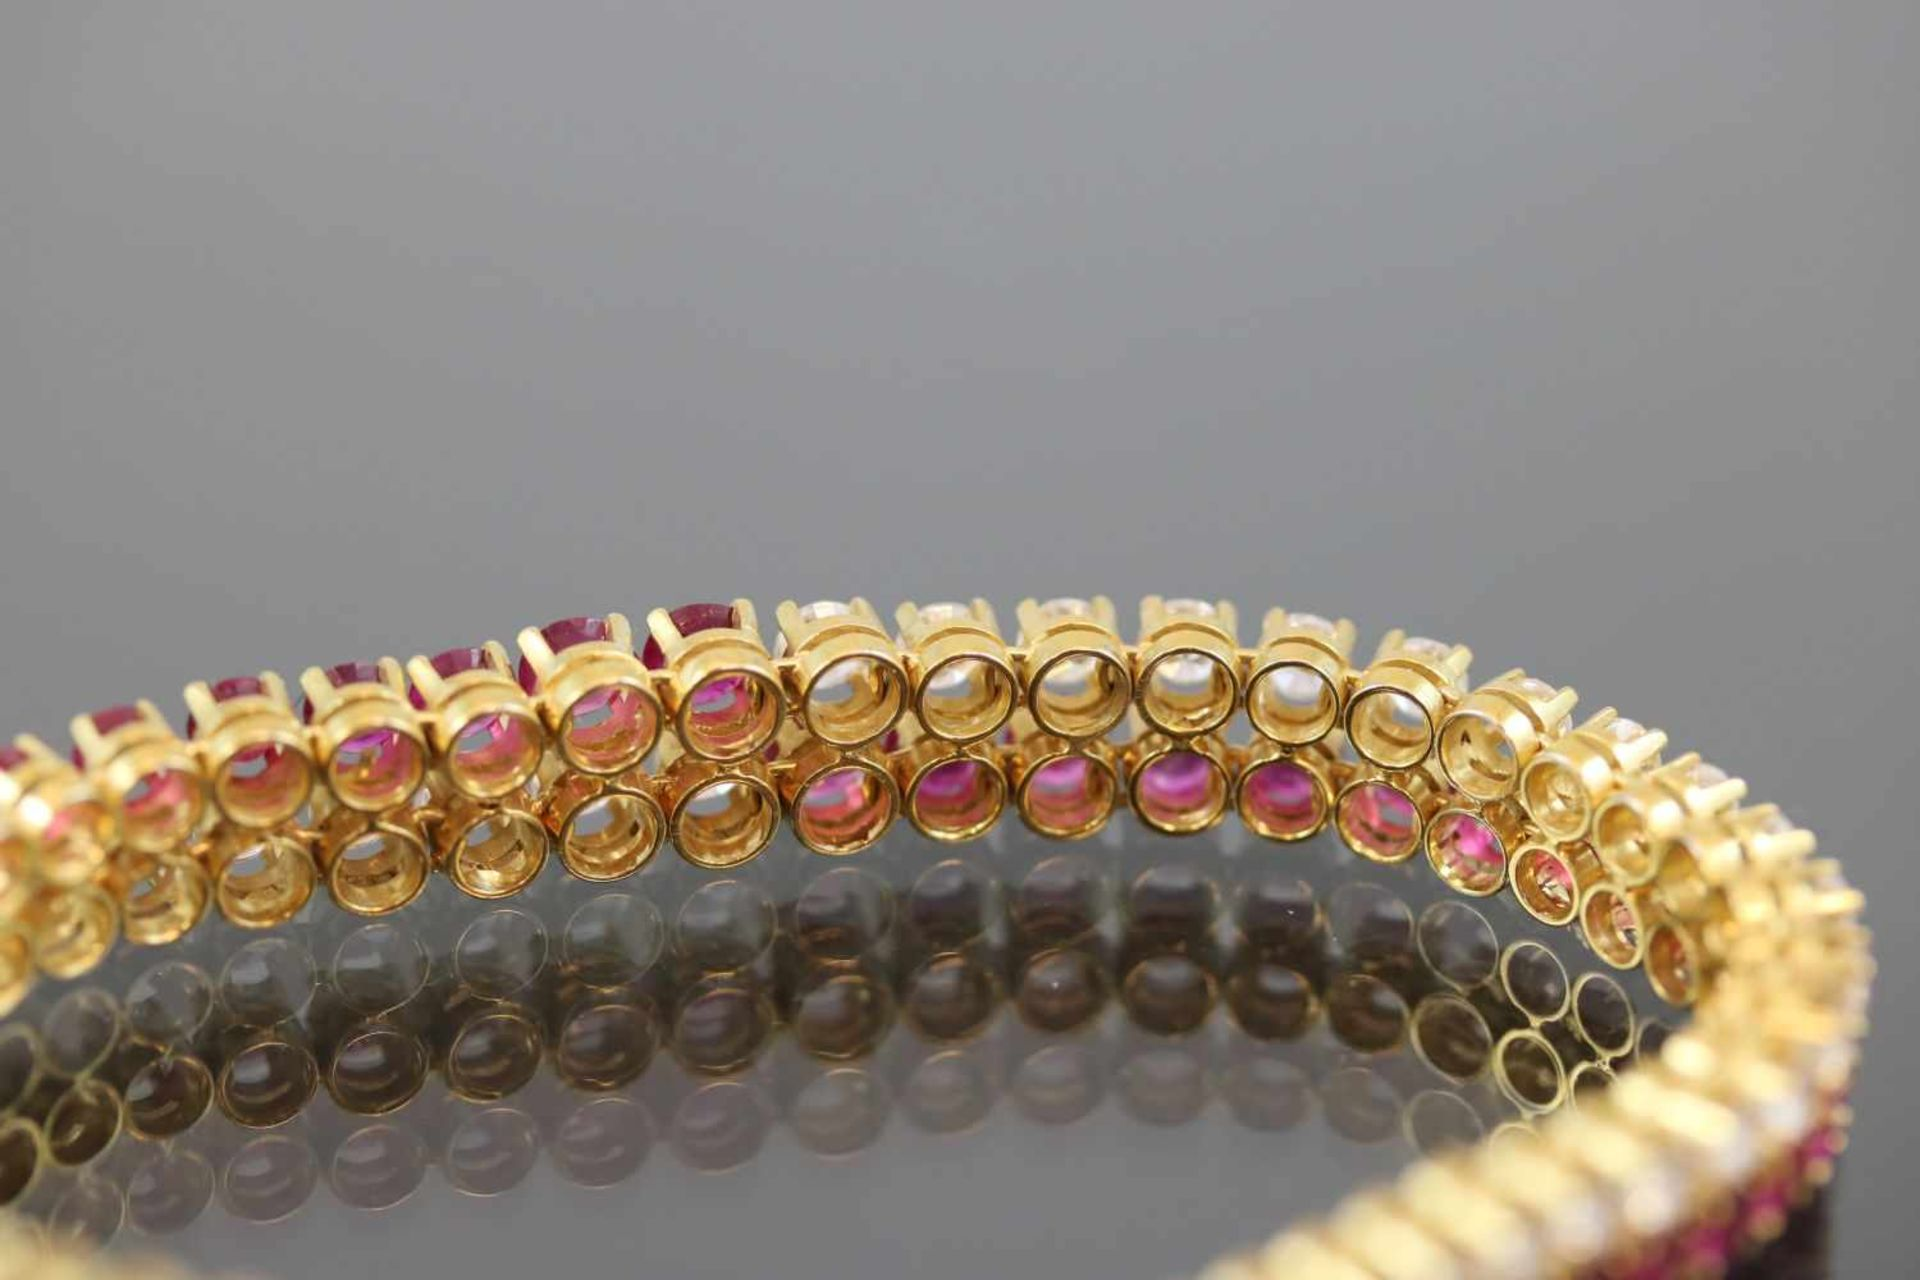 Los 7 - Rubin-Brillant-Armband, 750 Gelbgold25,9 Gramm Brillanten, ca. 5 ct., tw/vsi. Länge: 18 cm